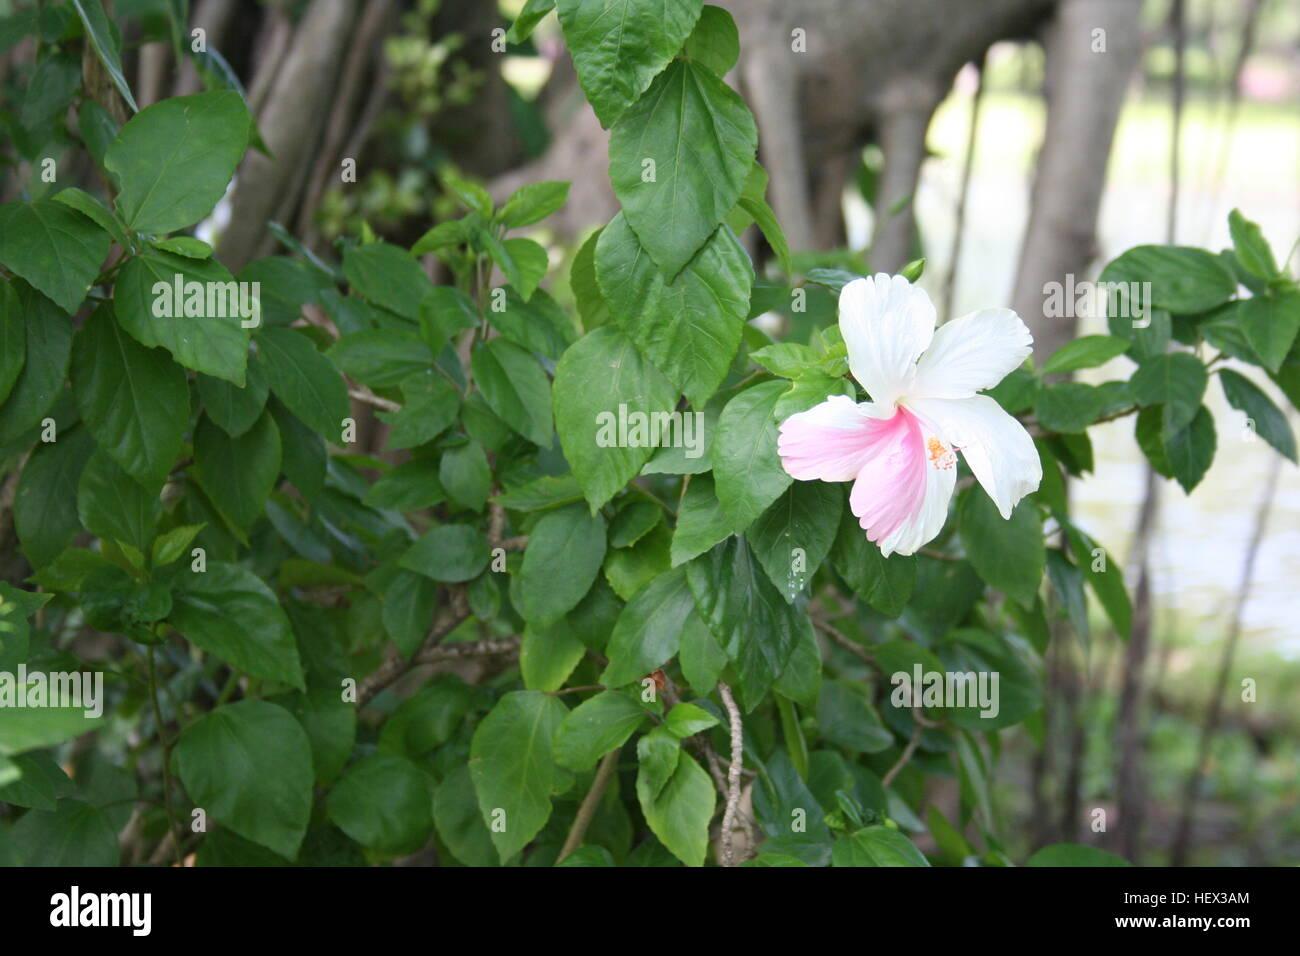 Pink White Orange Hibiscus Flower Stock Photos & Pink White Orange ...